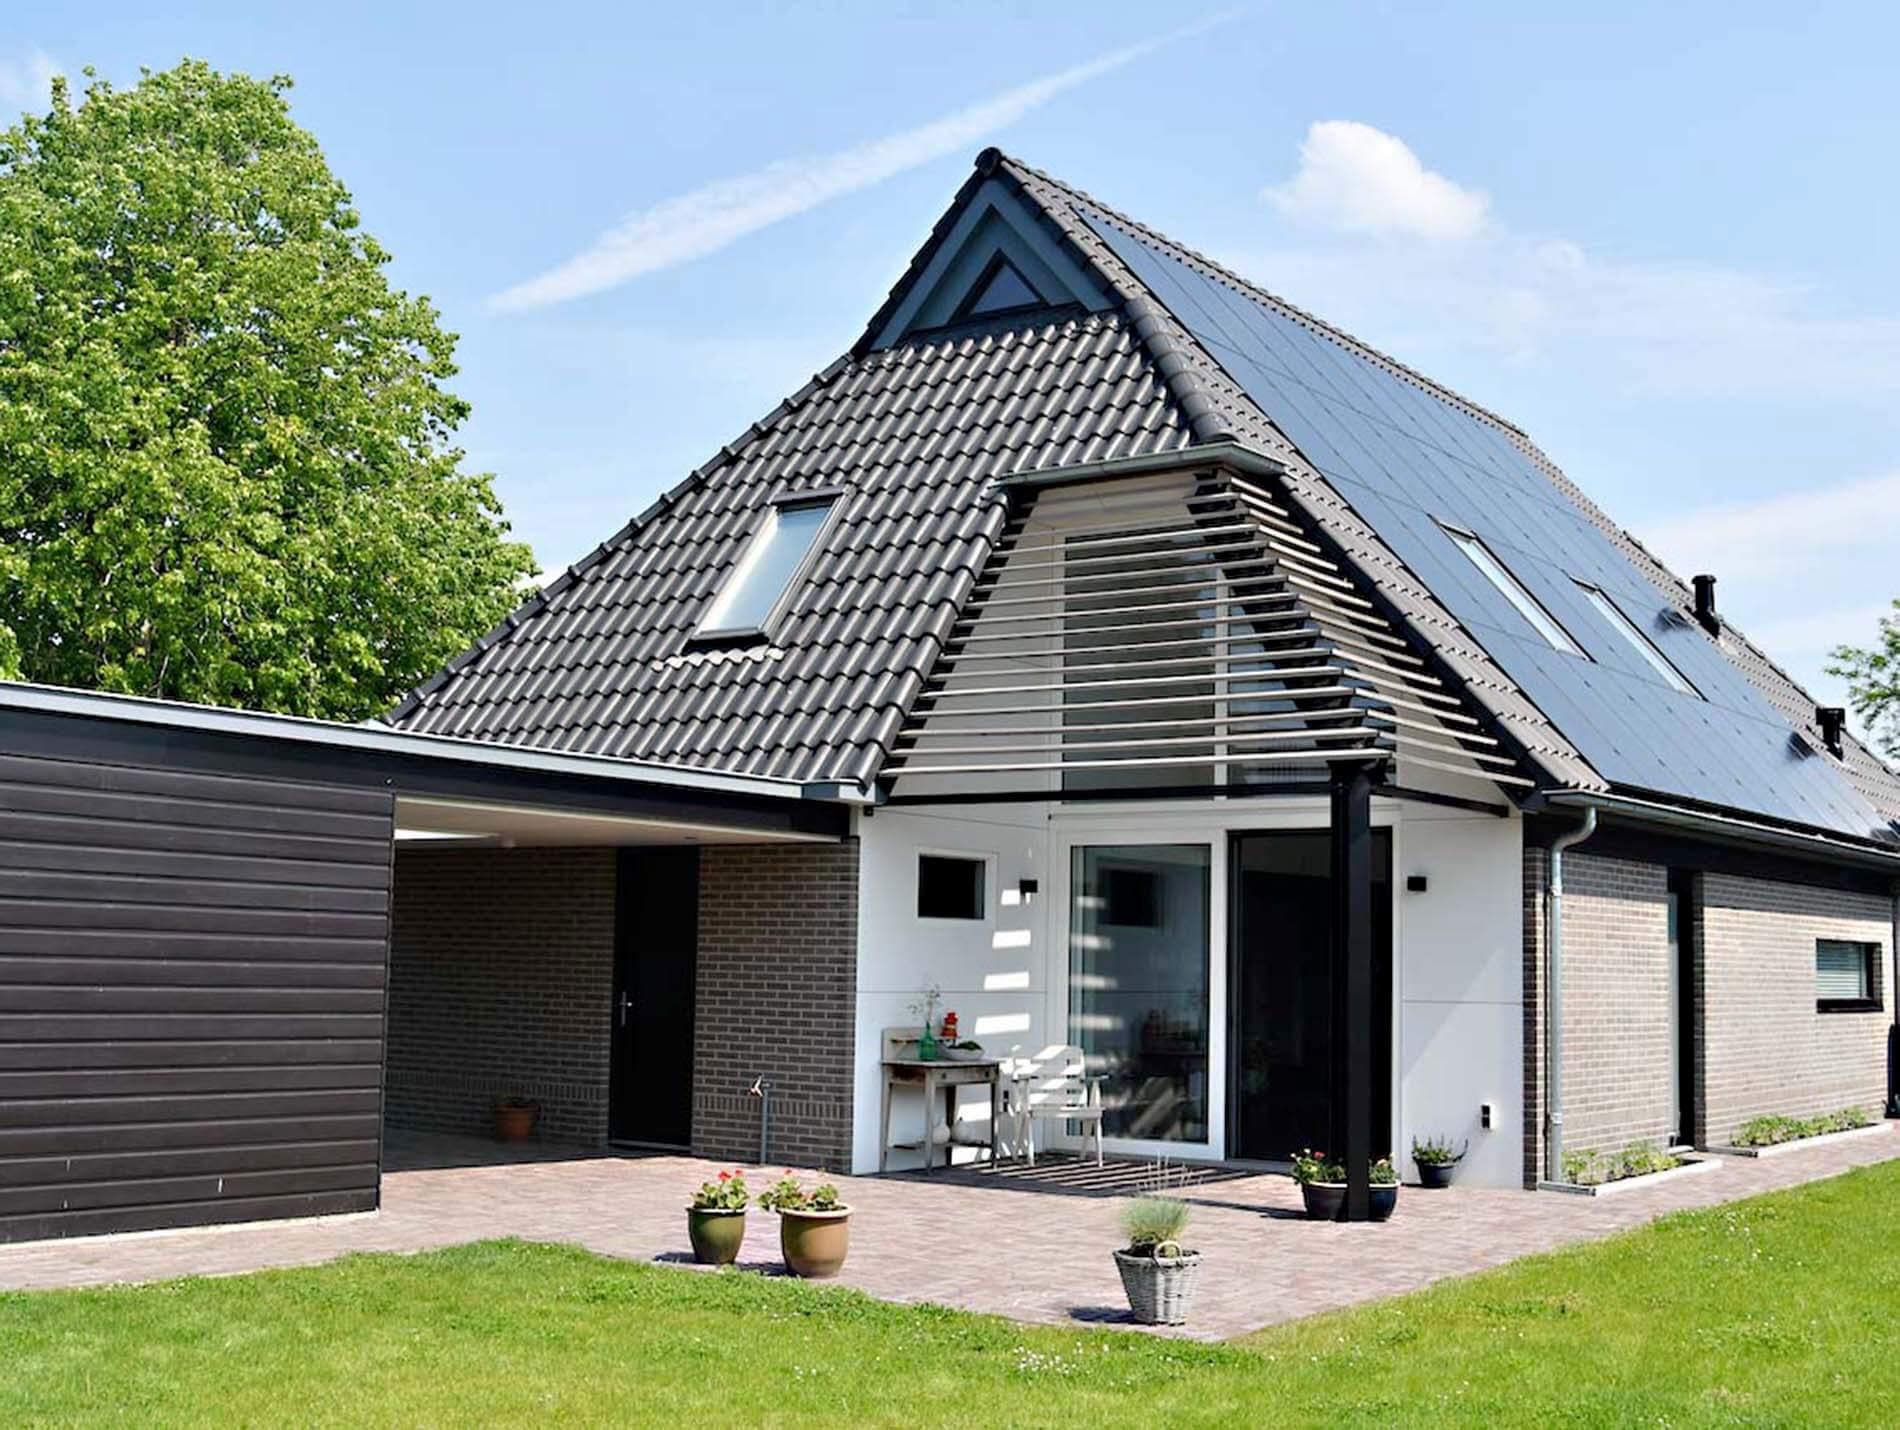 5. interieur-Wijnjewouden-particuliere-woning-1900x1430p.jpg